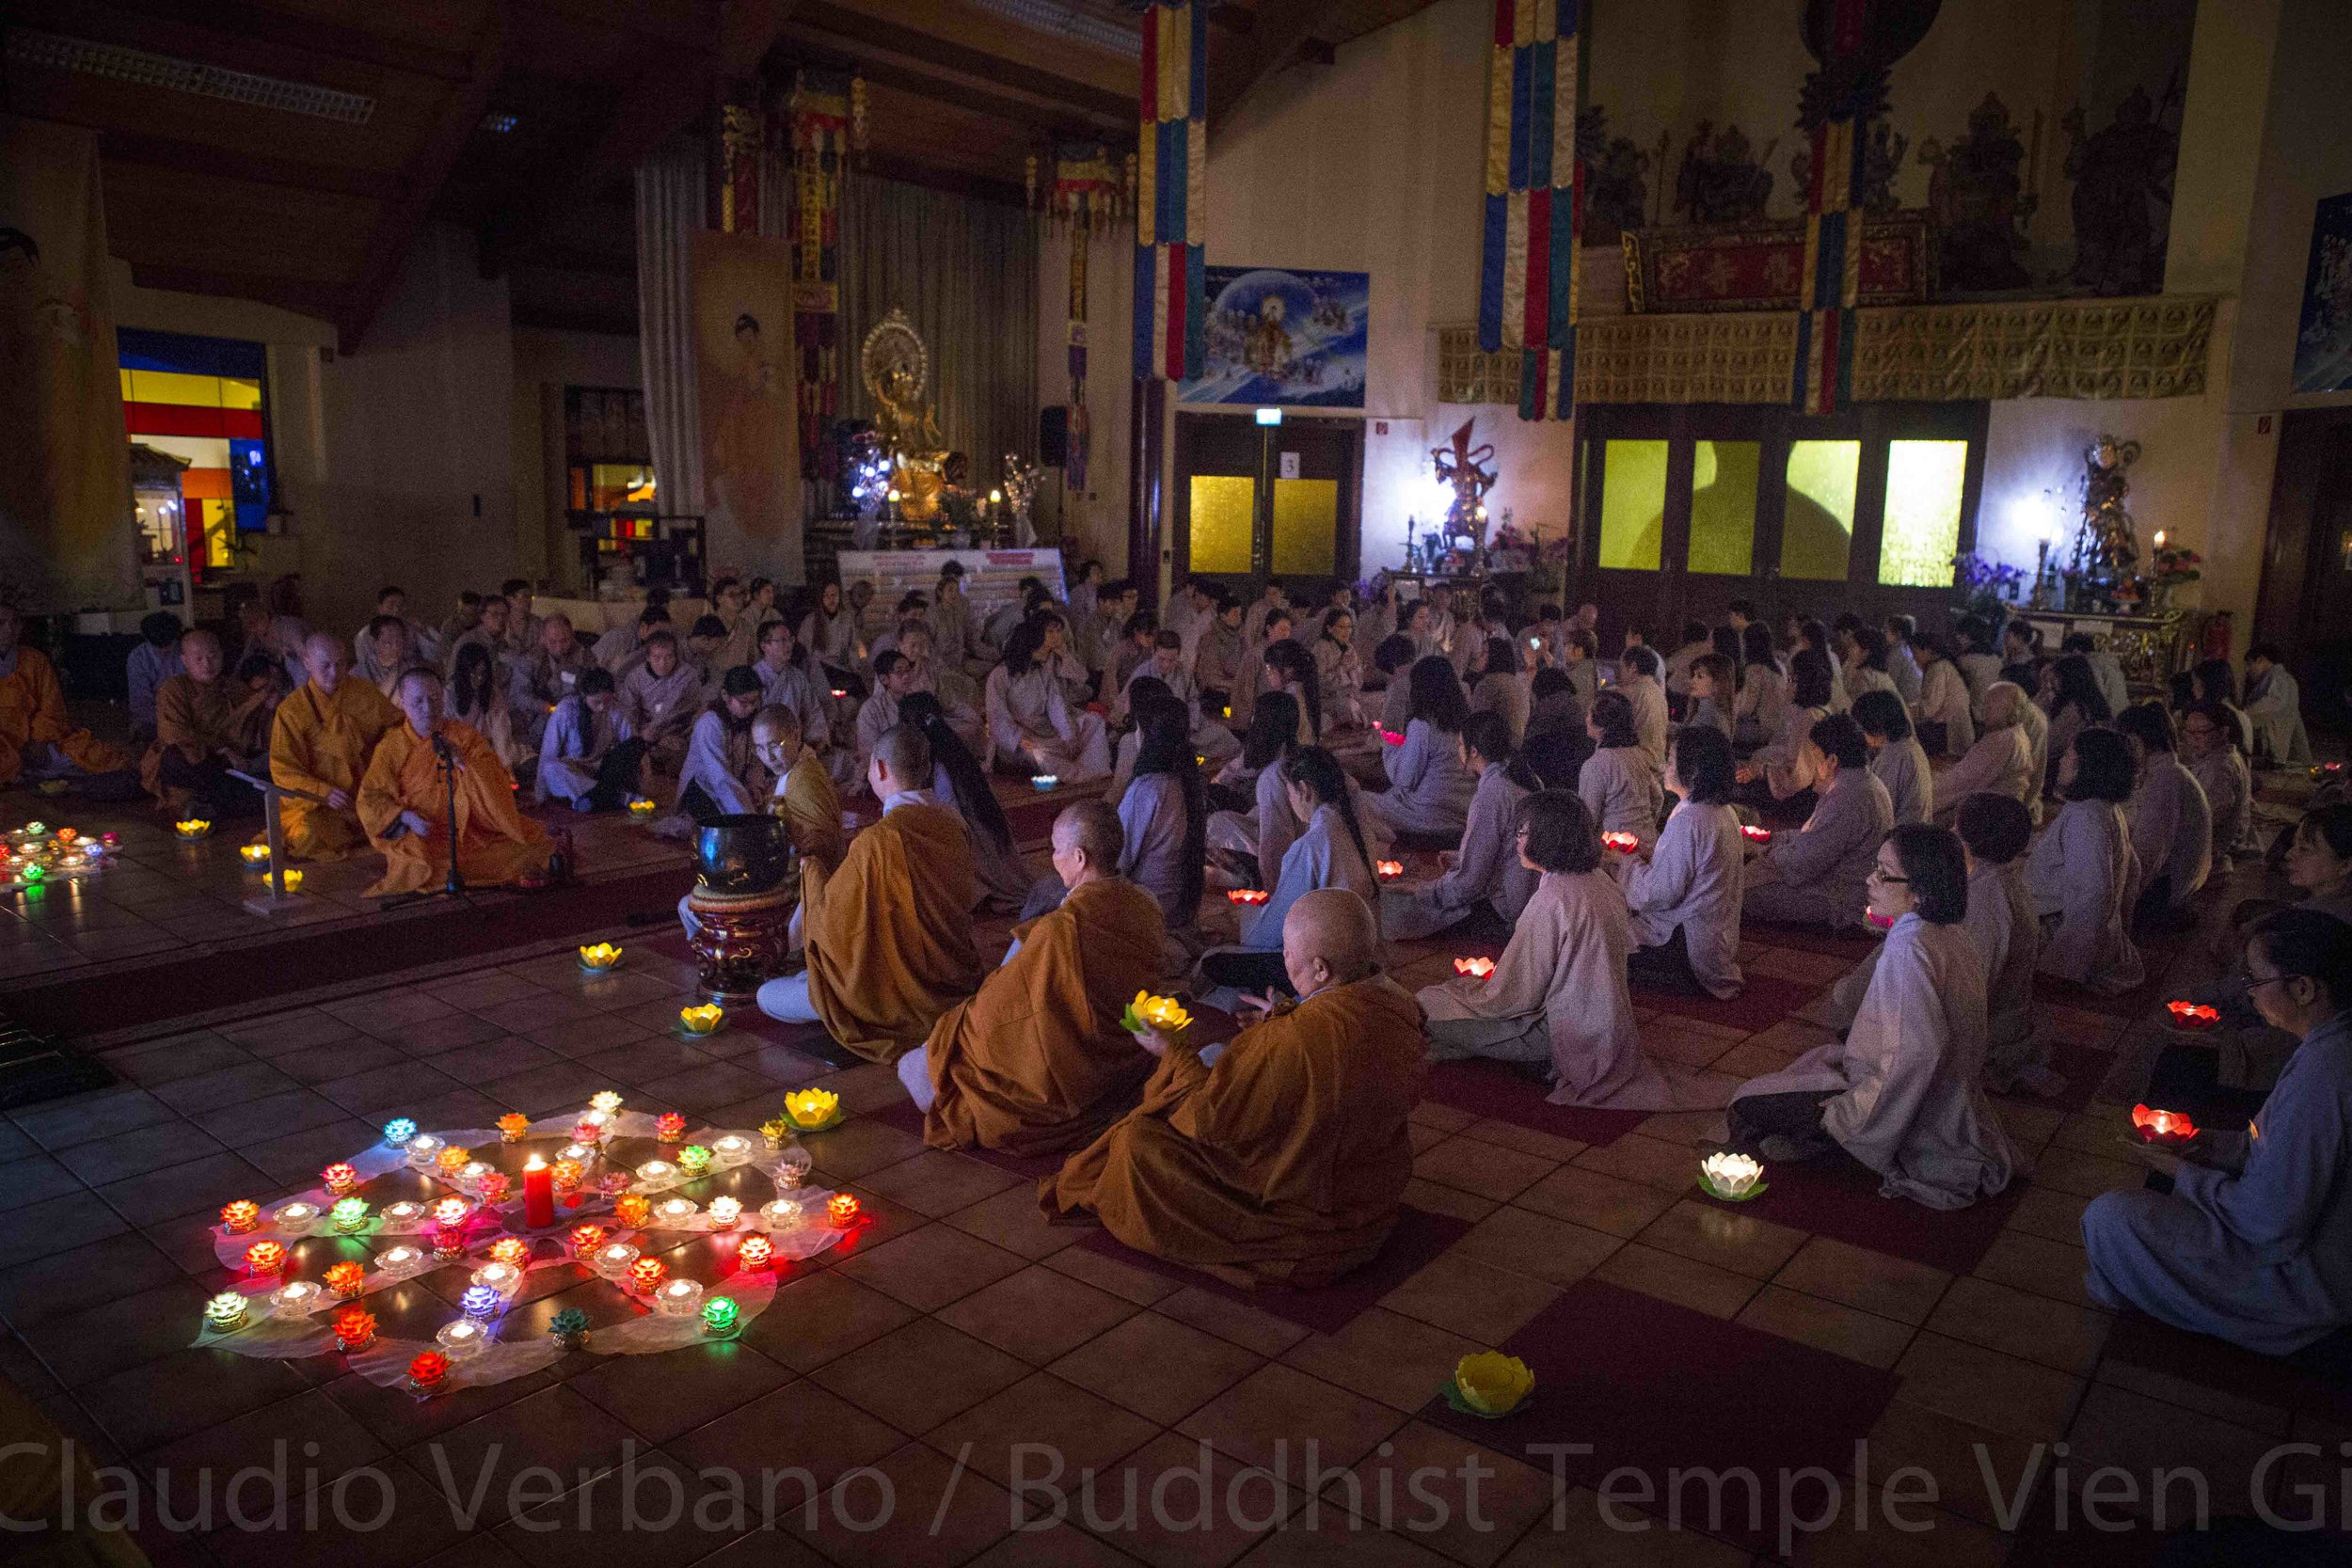 Buddhistischer Tempel Vien Giac Hannover Claudio Verbano_10.jpg